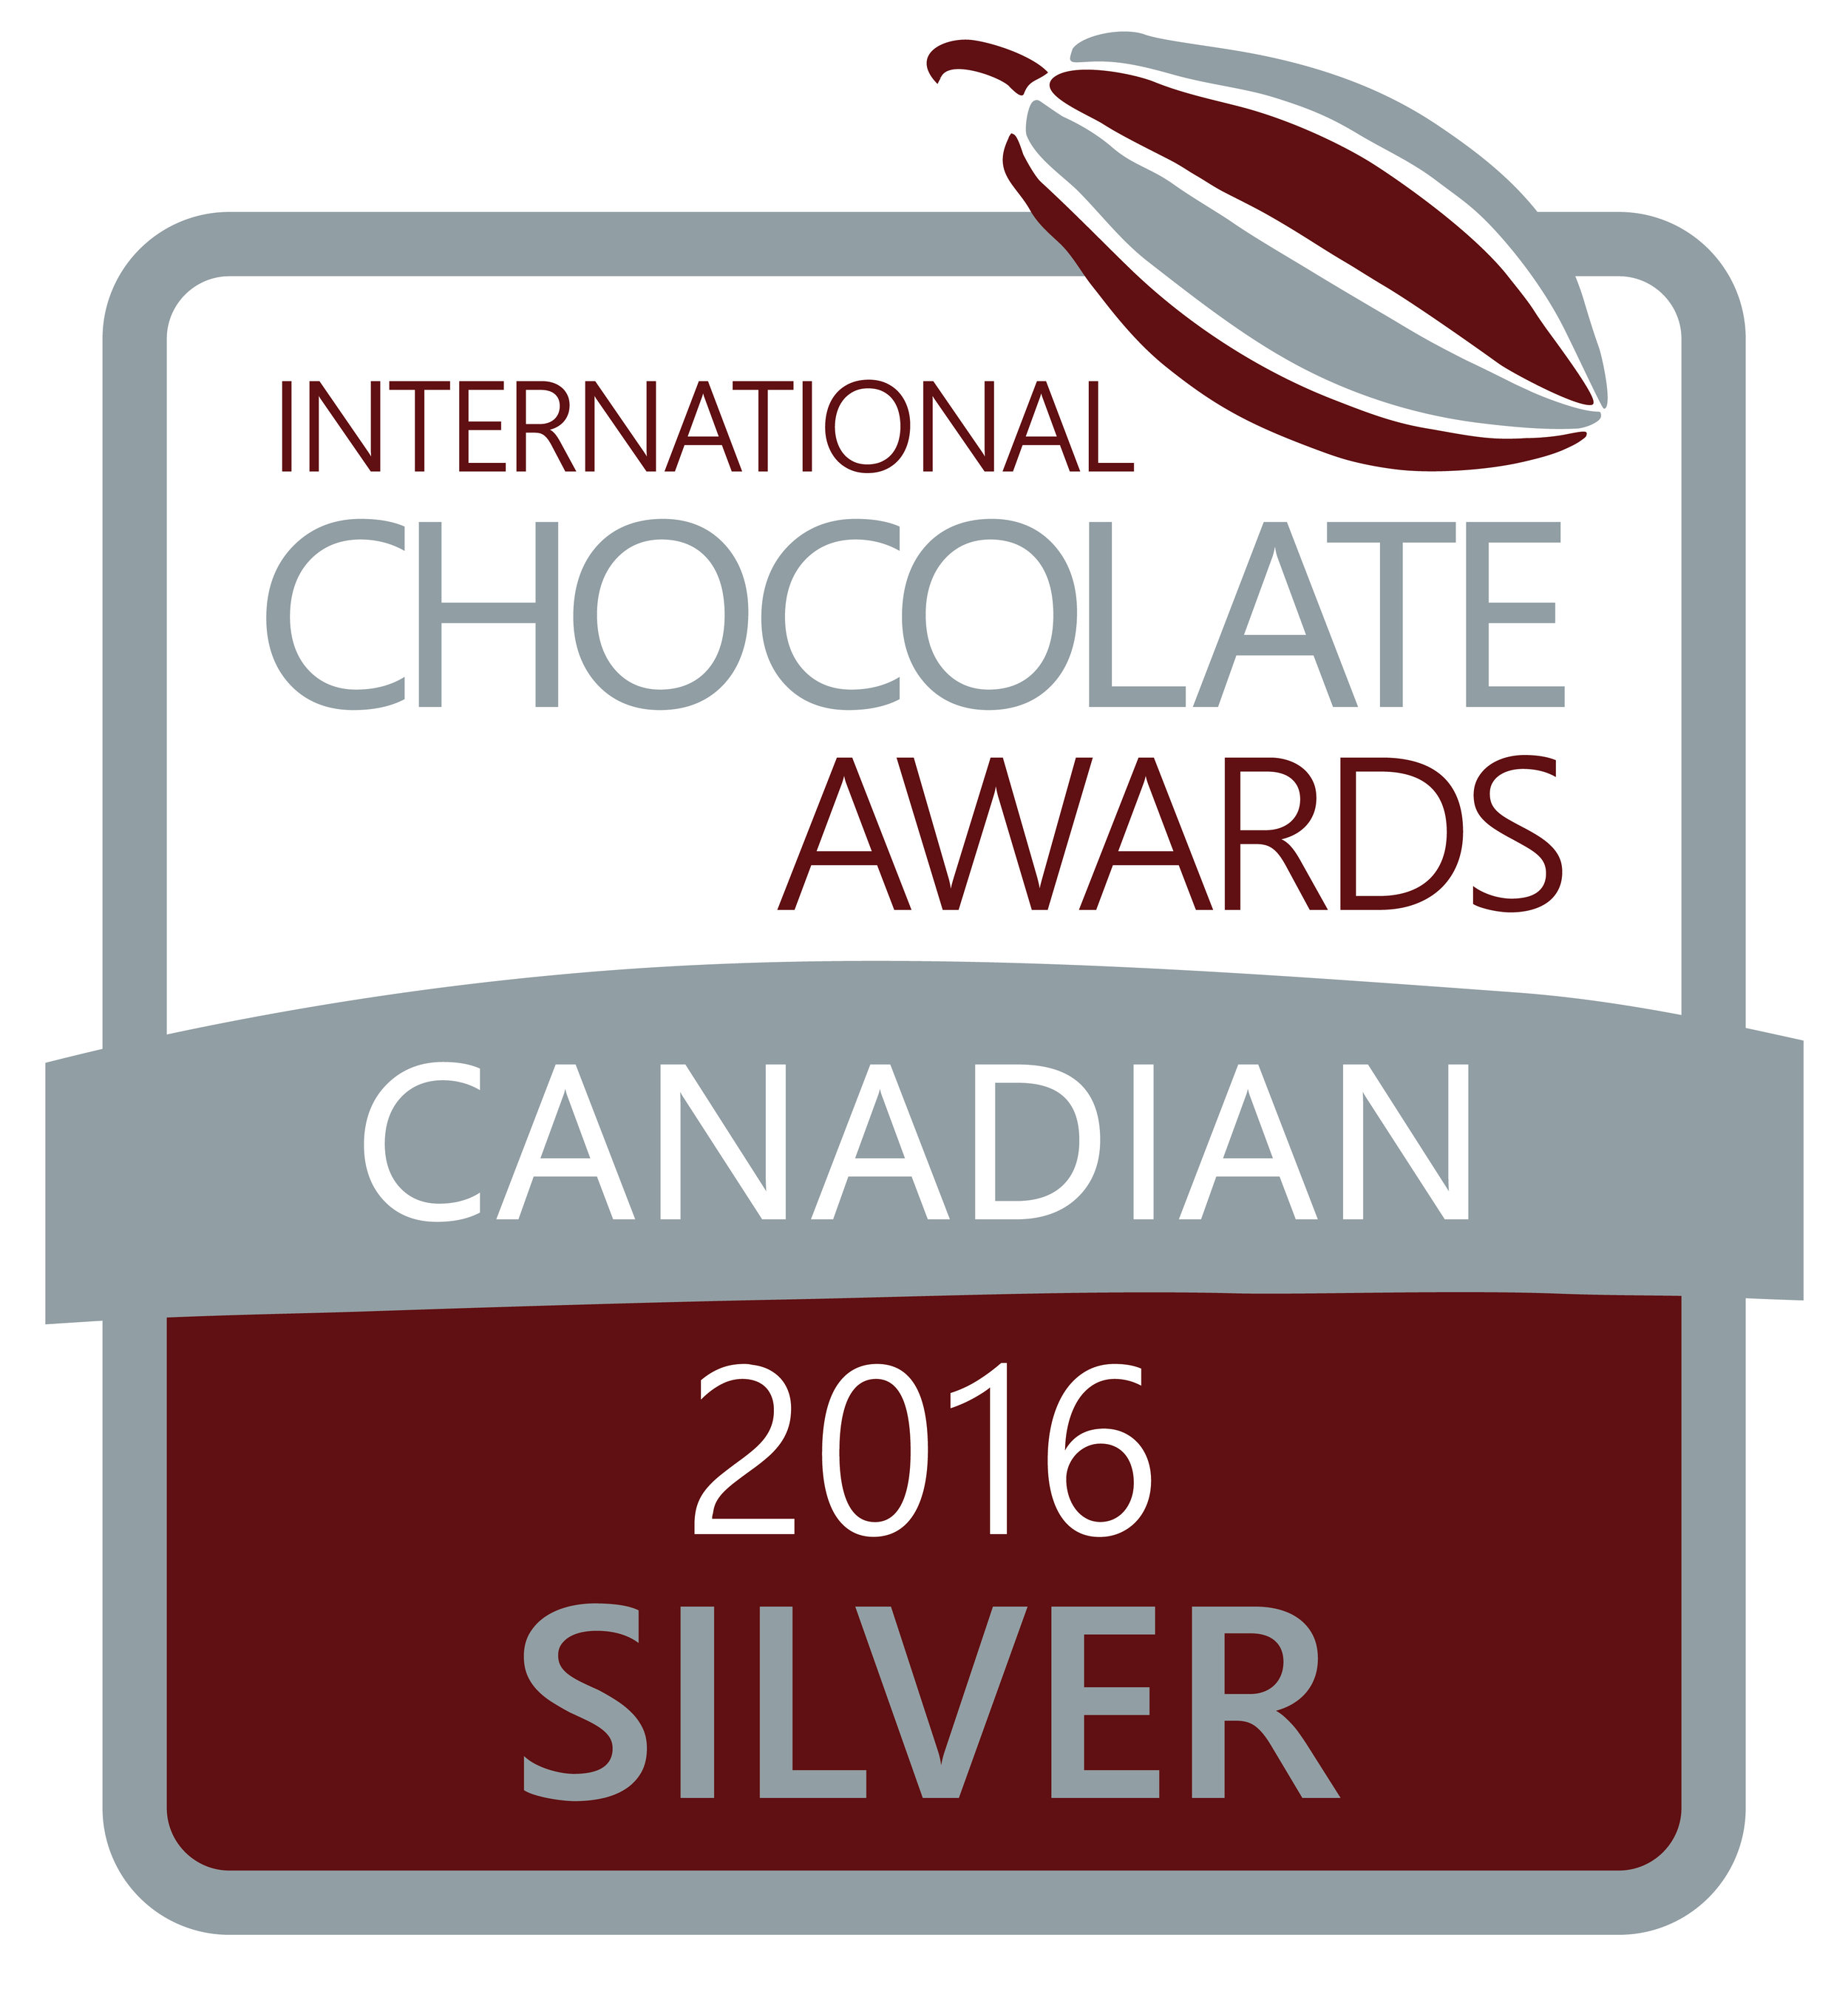 ica-prize-logo-2016-silver-canadian-rgb.jpg